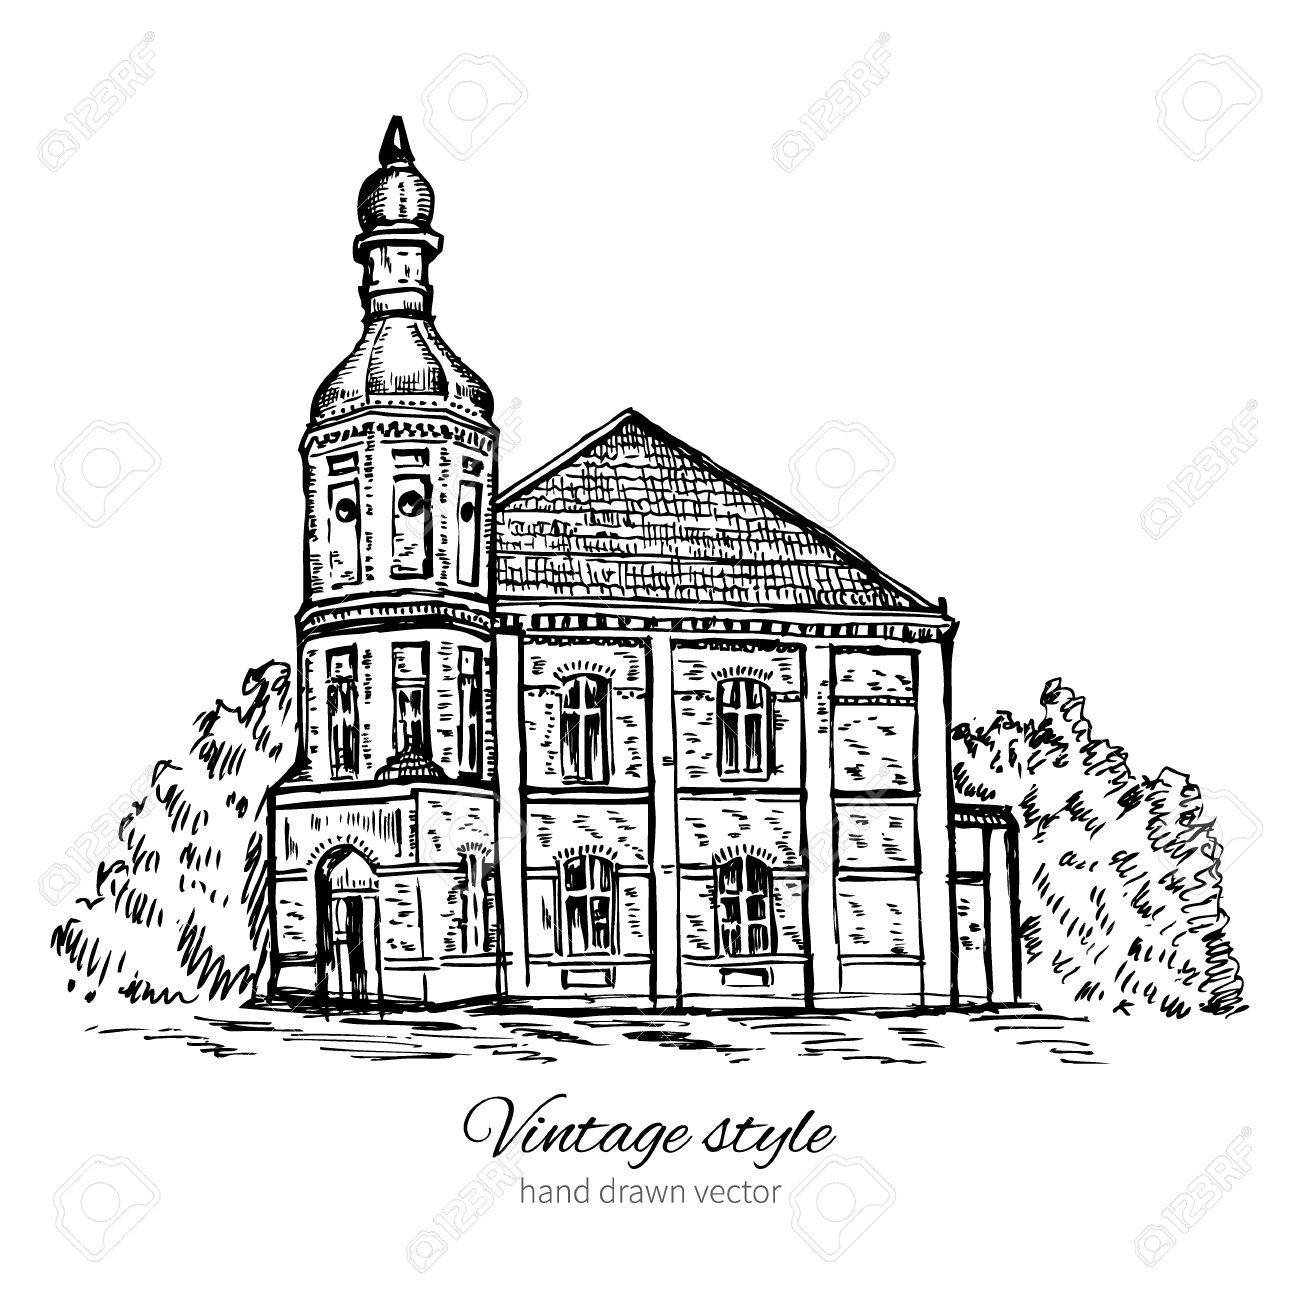 1300x1300 Vintage Vector Sketch Tile Old House, Abandoned Church, Historical